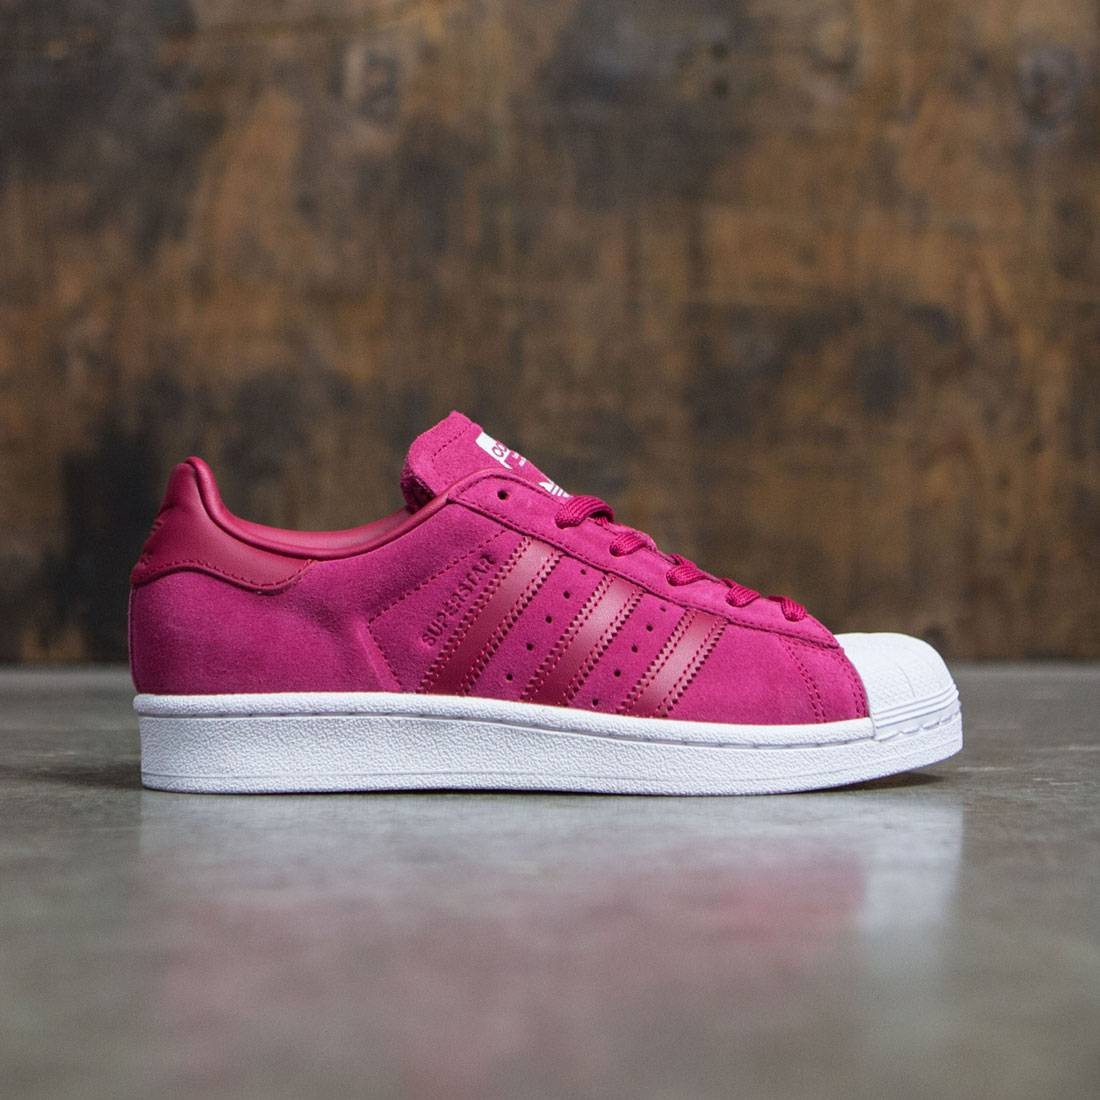 Adidas Women Superstar...Q Street Fighter 4